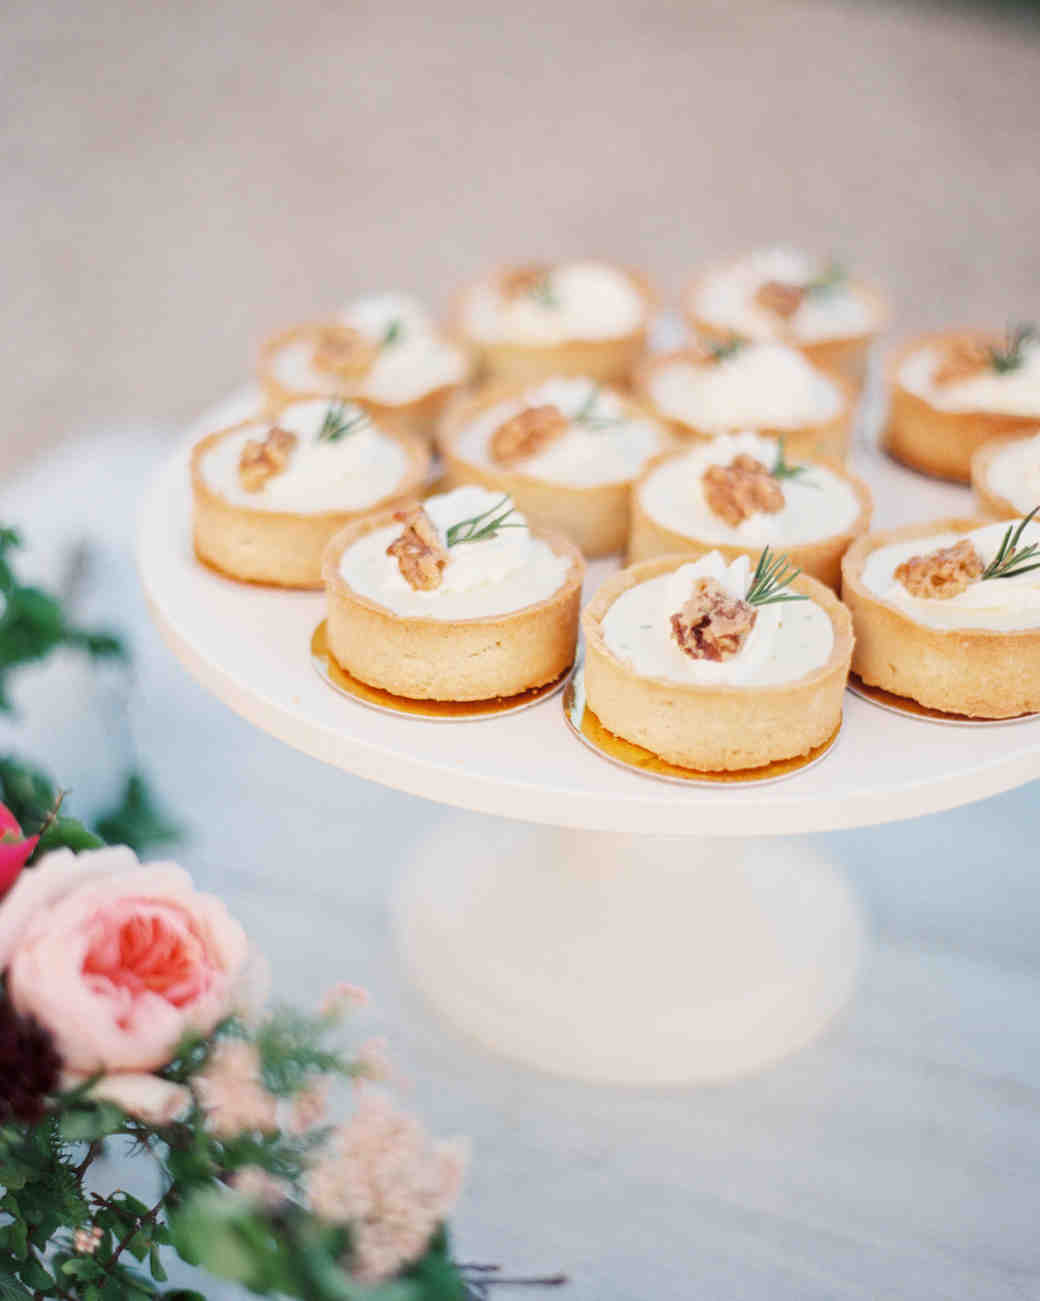 paige-chris-wedding-suite-122-s111485-0914.jpg